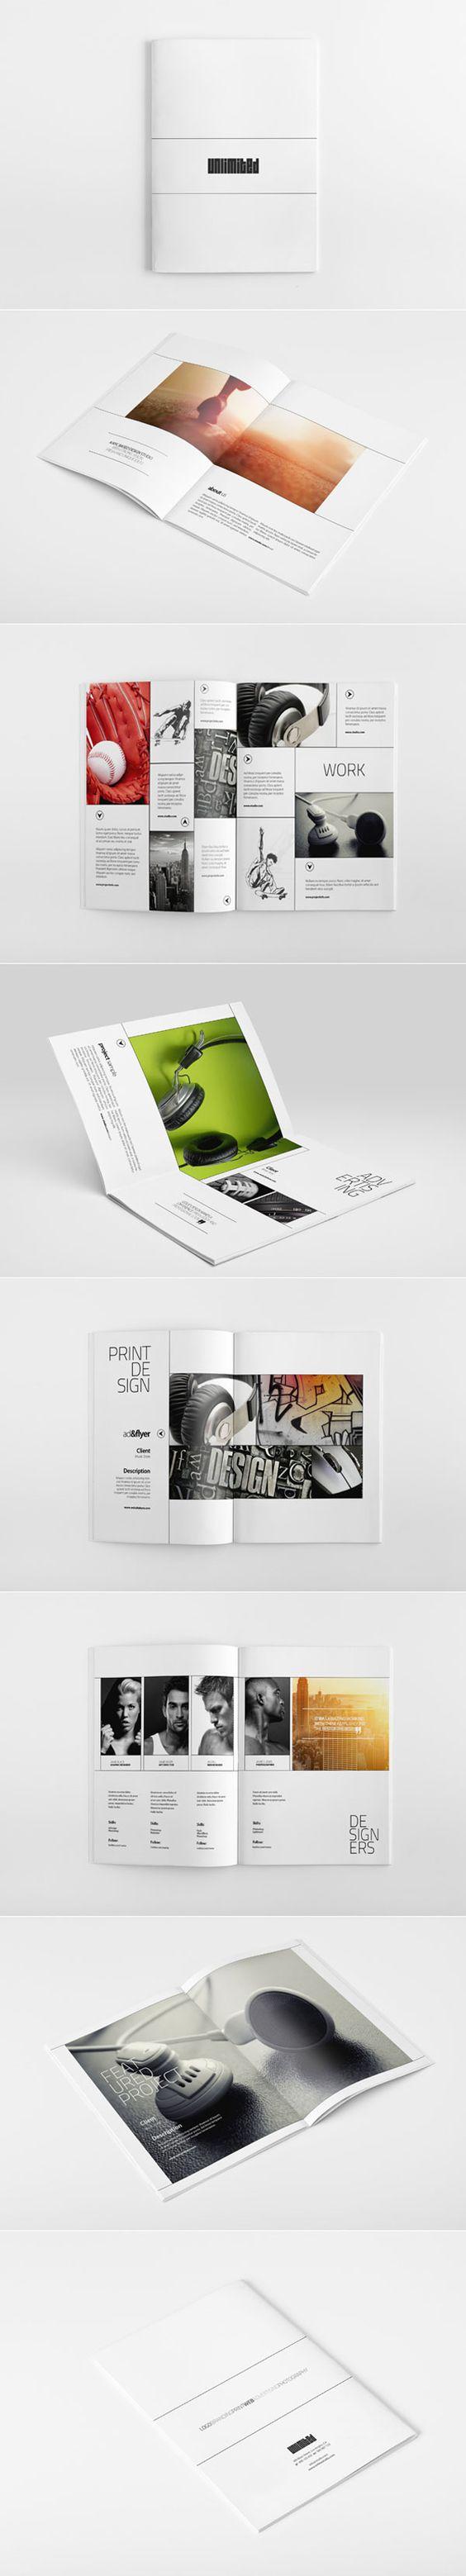 attractive brochure designs - portfolio brochure design ideas 20 simple yet beautiful